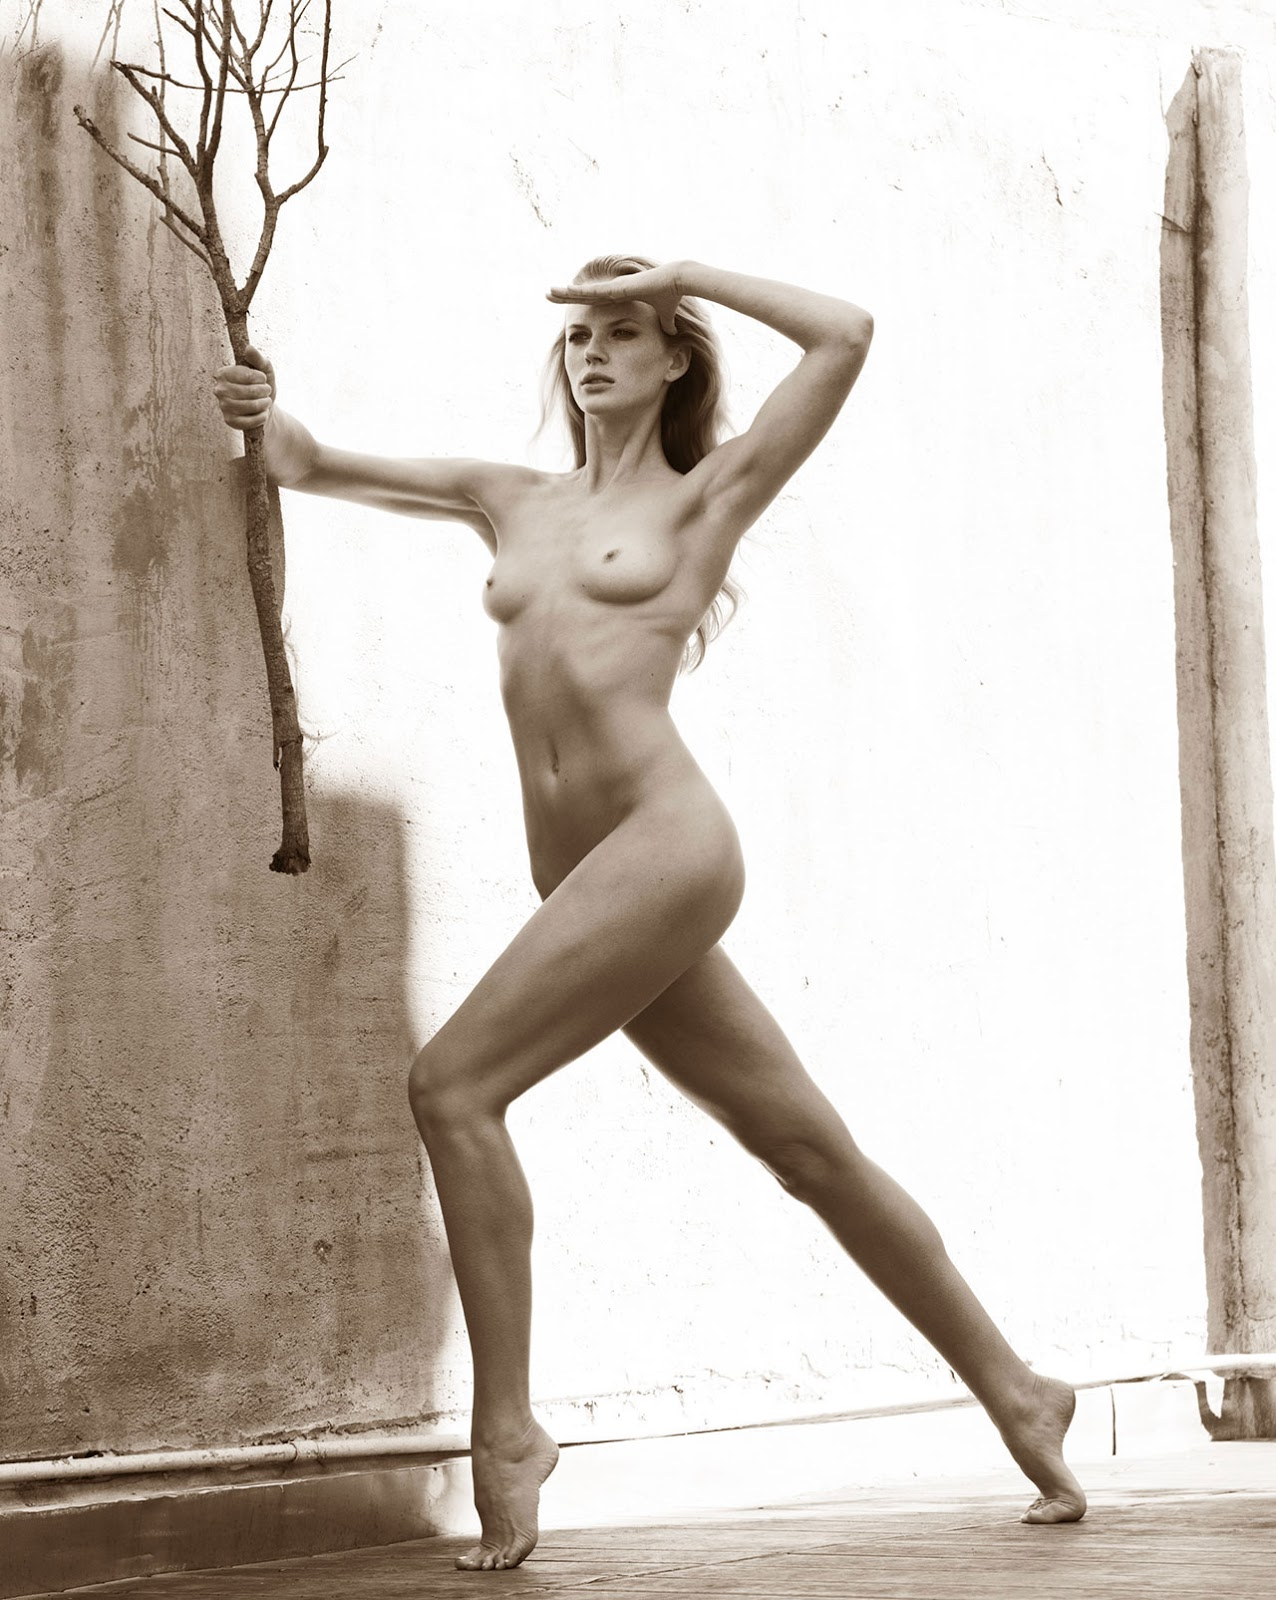 http://2.bp.blogspot.com/-T0LbrpVHe-c/UQRn2ildqxI/AAAAAAAAtdk/aONg_rA7q18/s1600/Anne+Vyalitsyna+-+Nude+in+a+Mariano+Vivanco+Photoshoot%252C+2012+%2528X3+HQ%2529+1.jpg